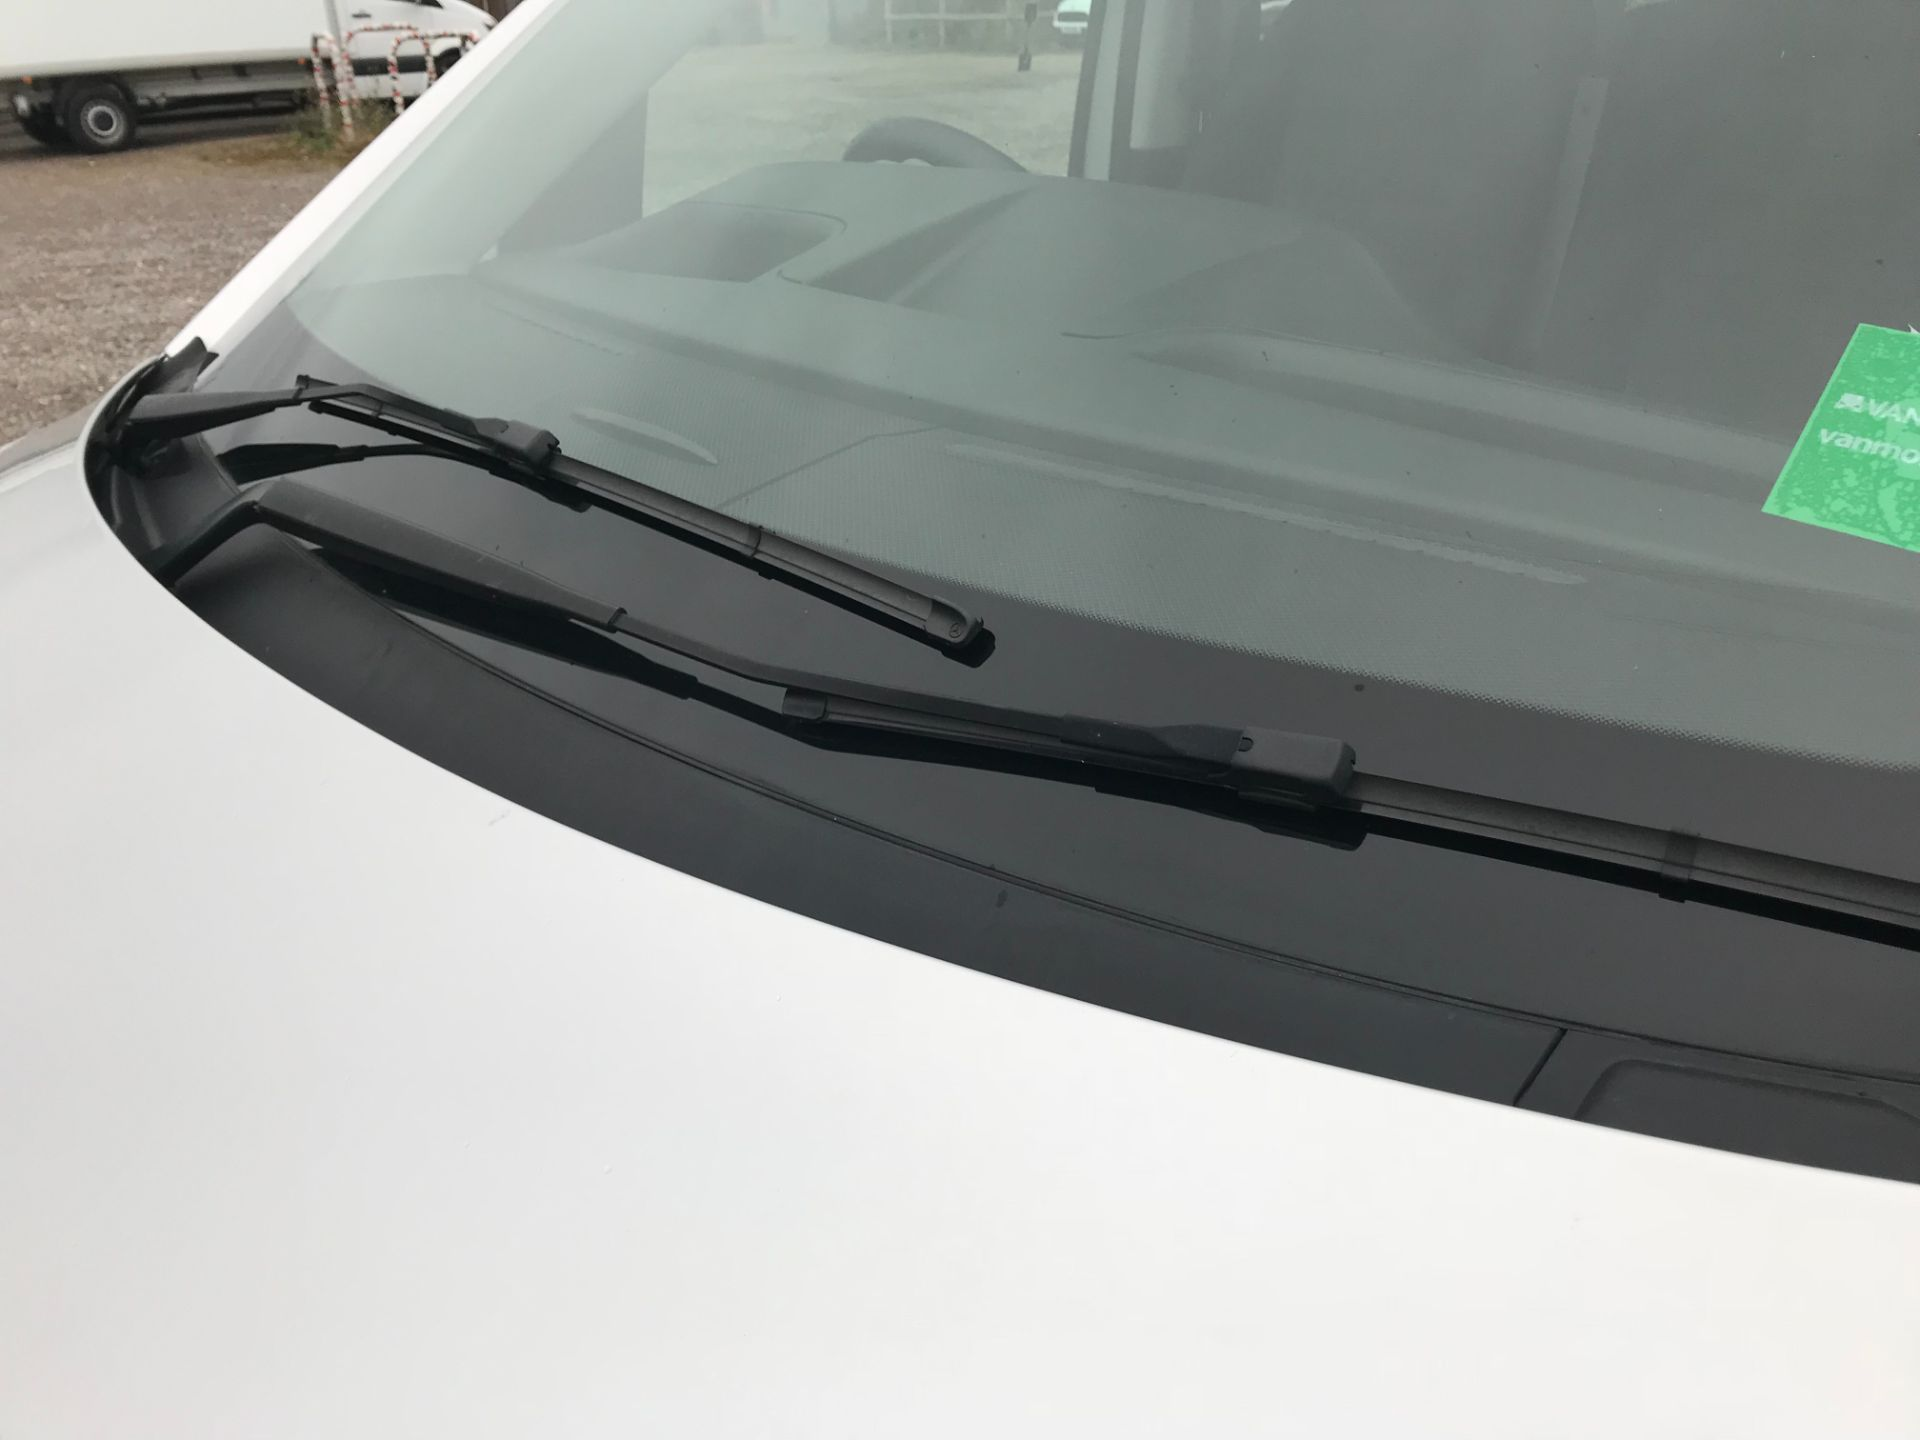 2019 Mercedes-Benz Vito 119 Cdi Select 8-Seater 7G-Tronic (KR19XWU) Image 33